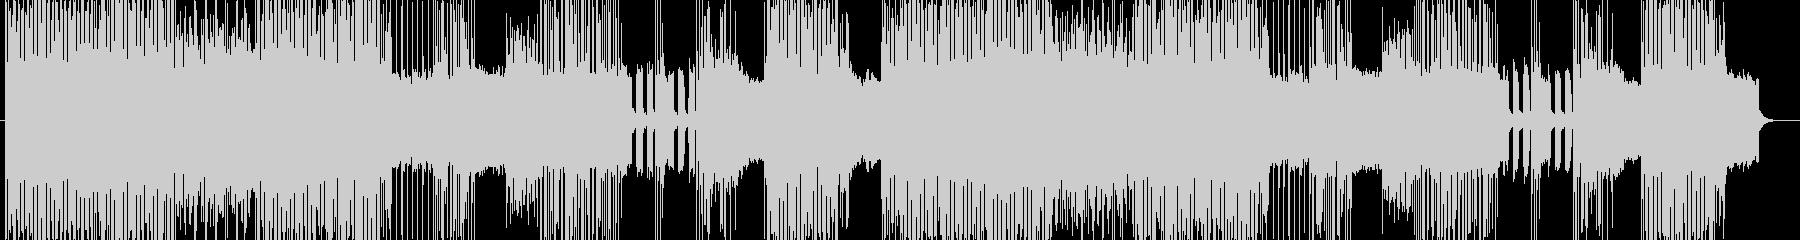 「HR/HM」「ROCK」BGM322の未再生の波形